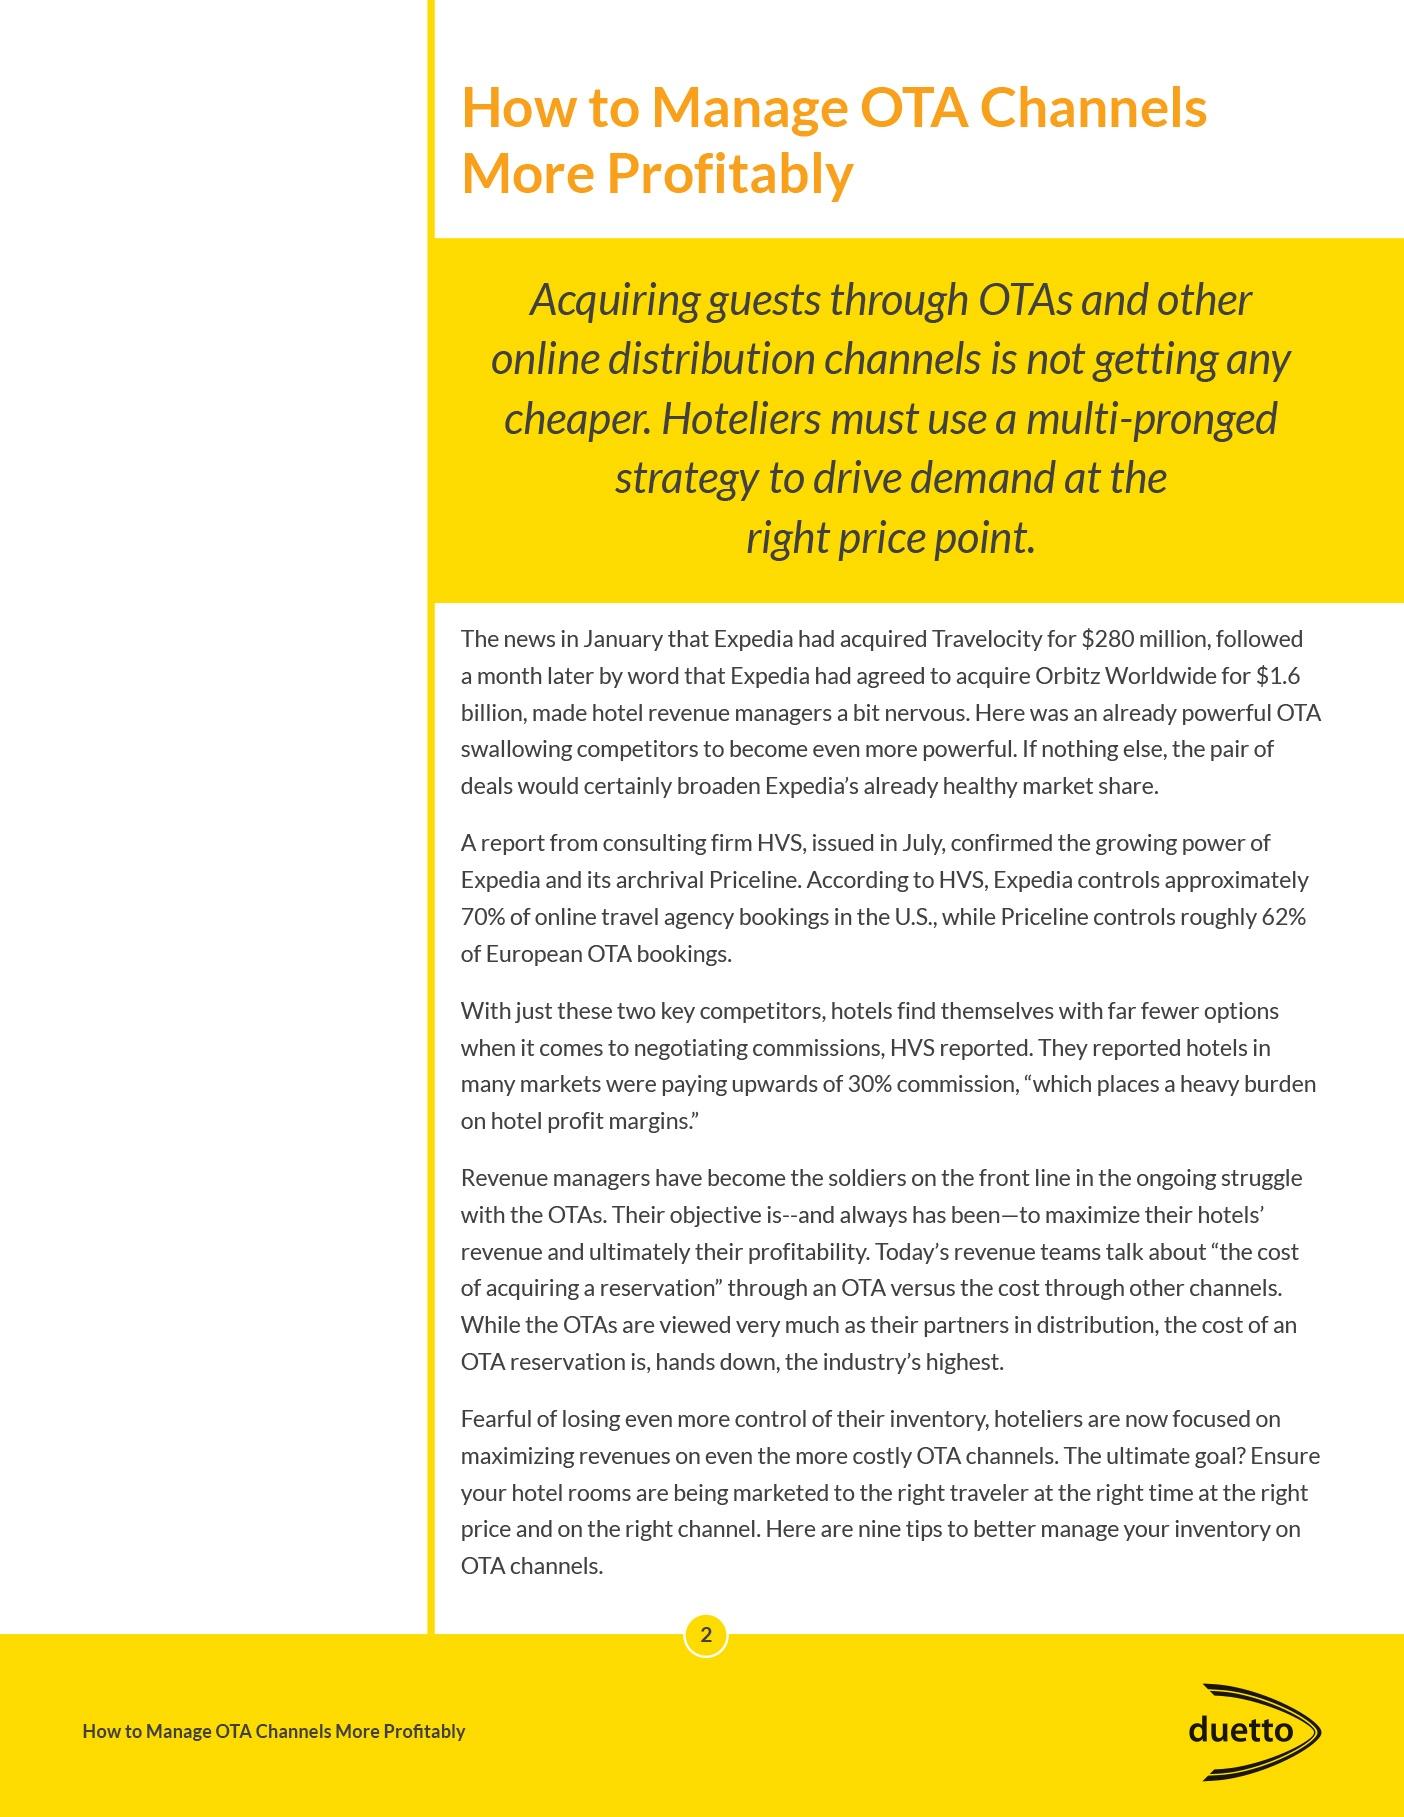 2 Manage OTA Channels More Profitably.jpg